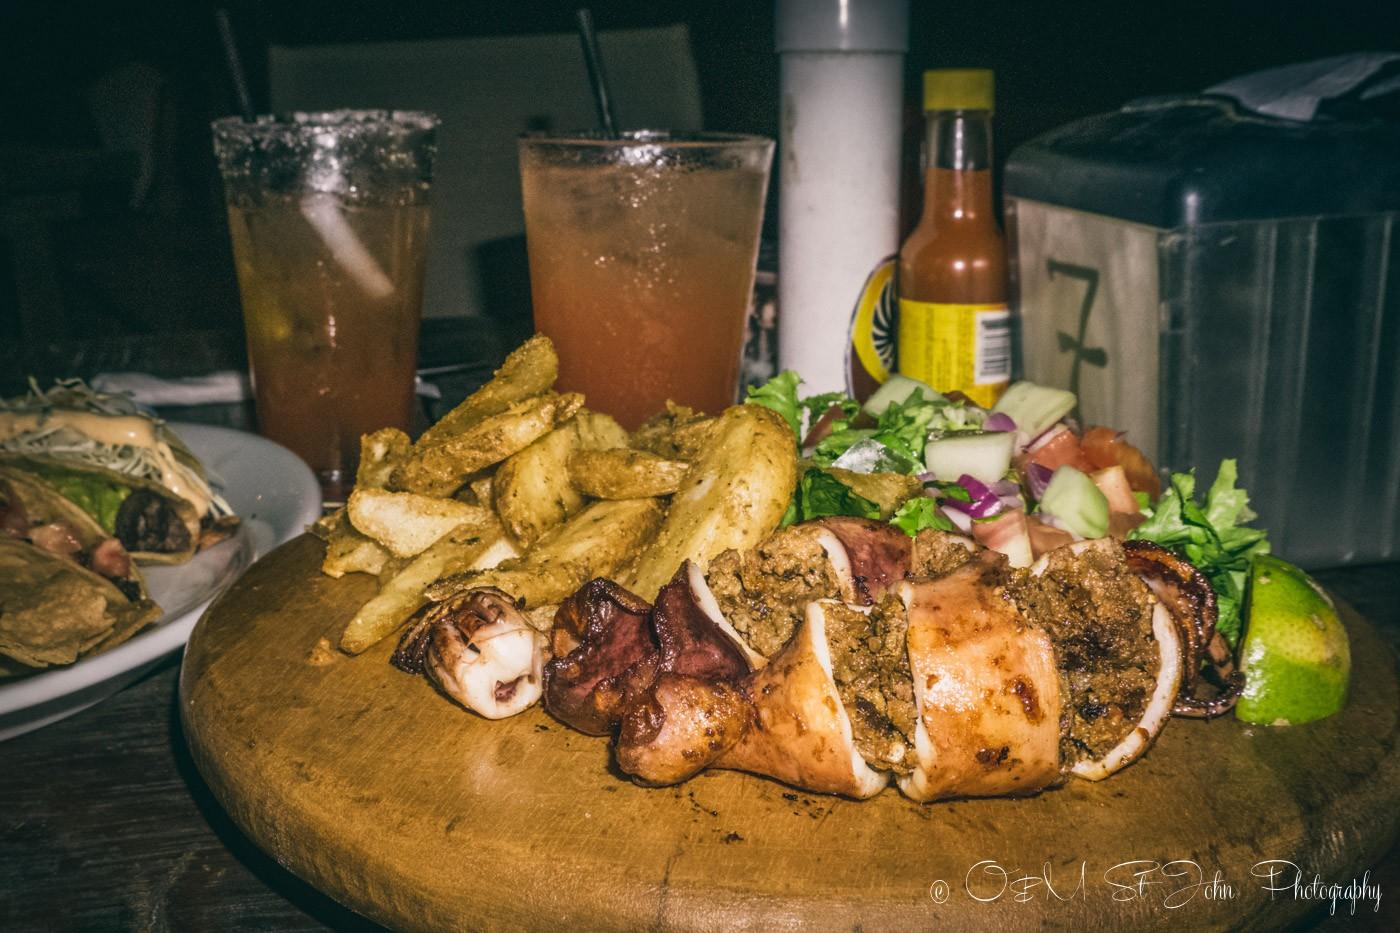 Calamari stuffed with chorriso at Lo Que Hay Restaurant in Samara. Costa Rica